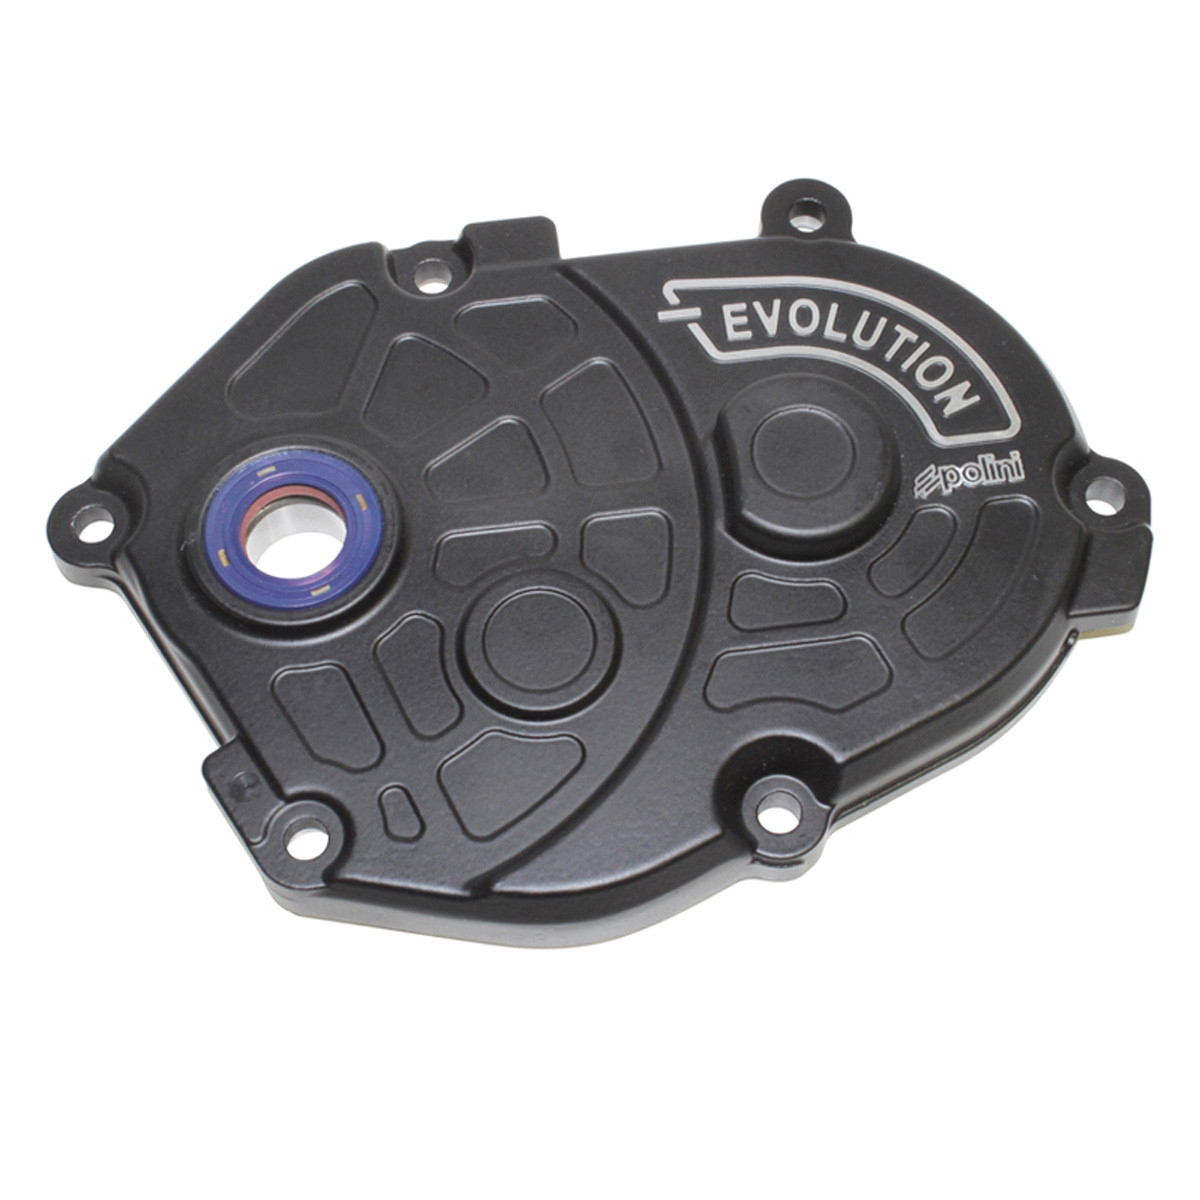 Carter Transmission MBK Booster, Nitro, YAMAHA Aerox, Bw's - POLINI Evolution